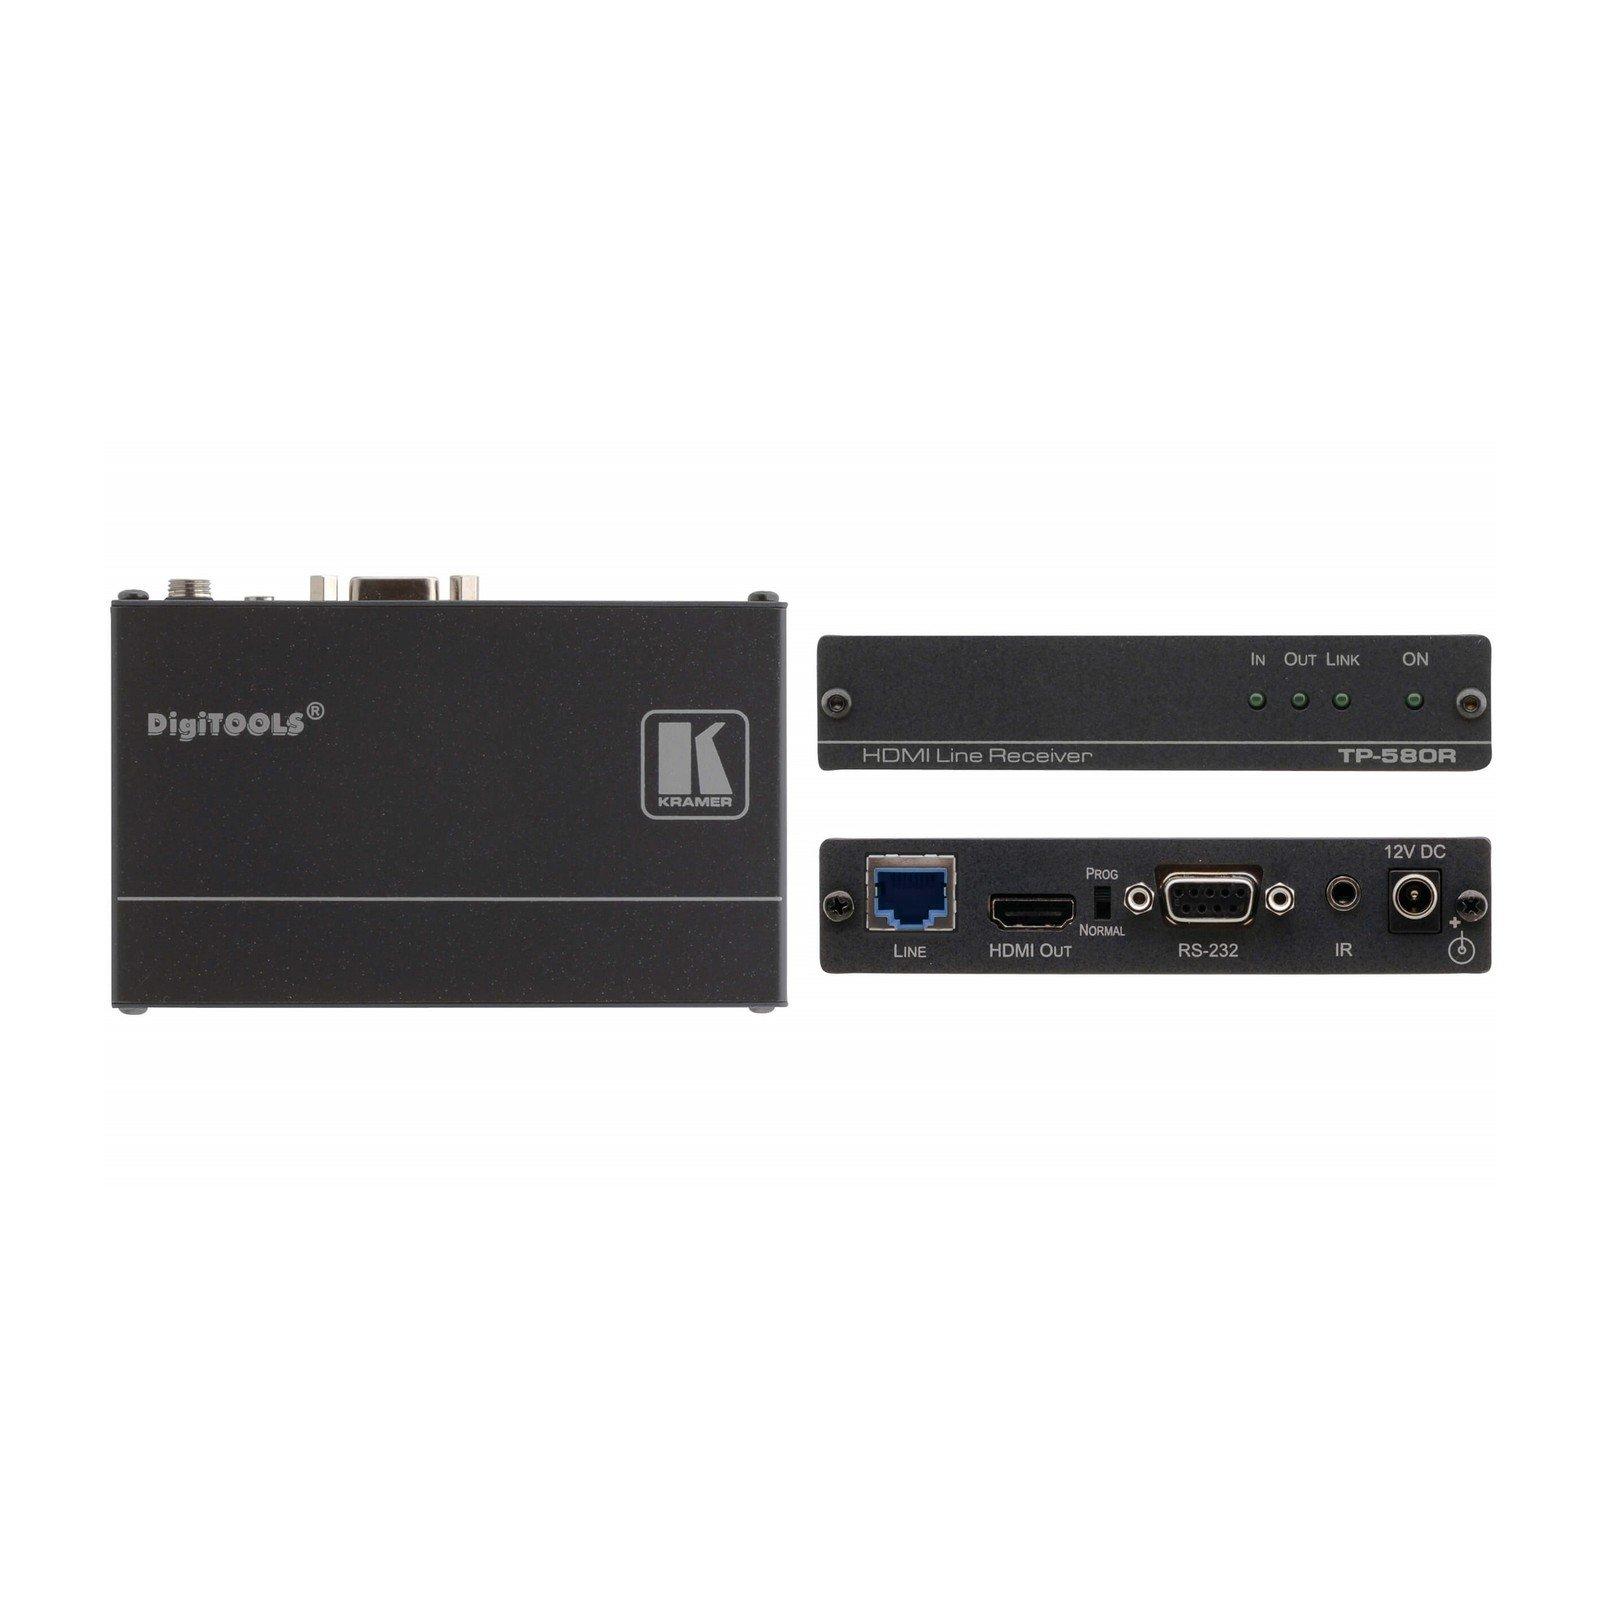 Kramer TP-580R | 4K UHD HDMI IP over Twisted Pair HDBaseT Receiver